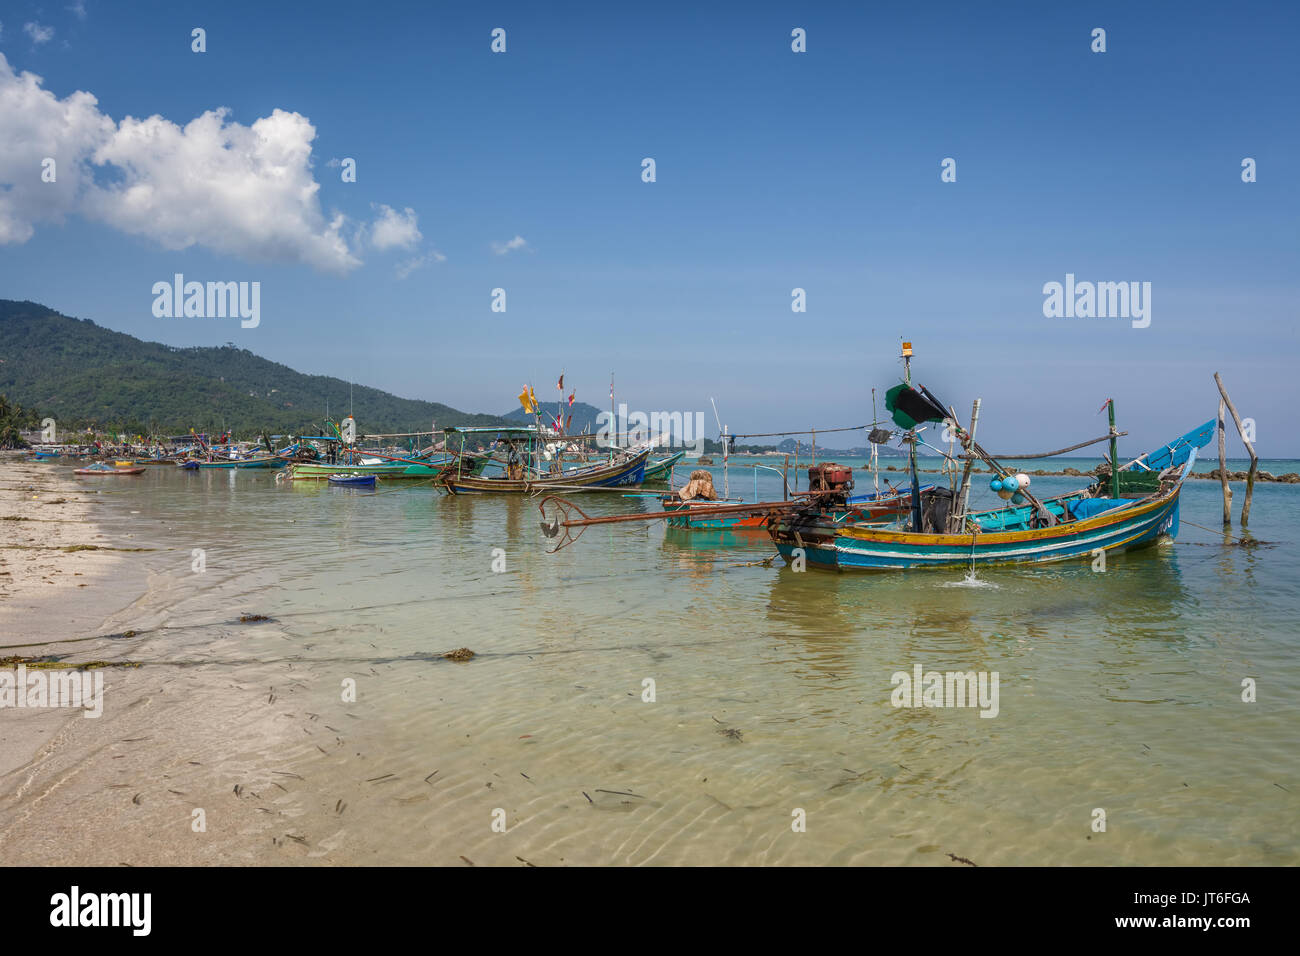 Thai fishing boats mooored at Hua Thanon beach, Koh Samui Island, Thailand - Stock Image